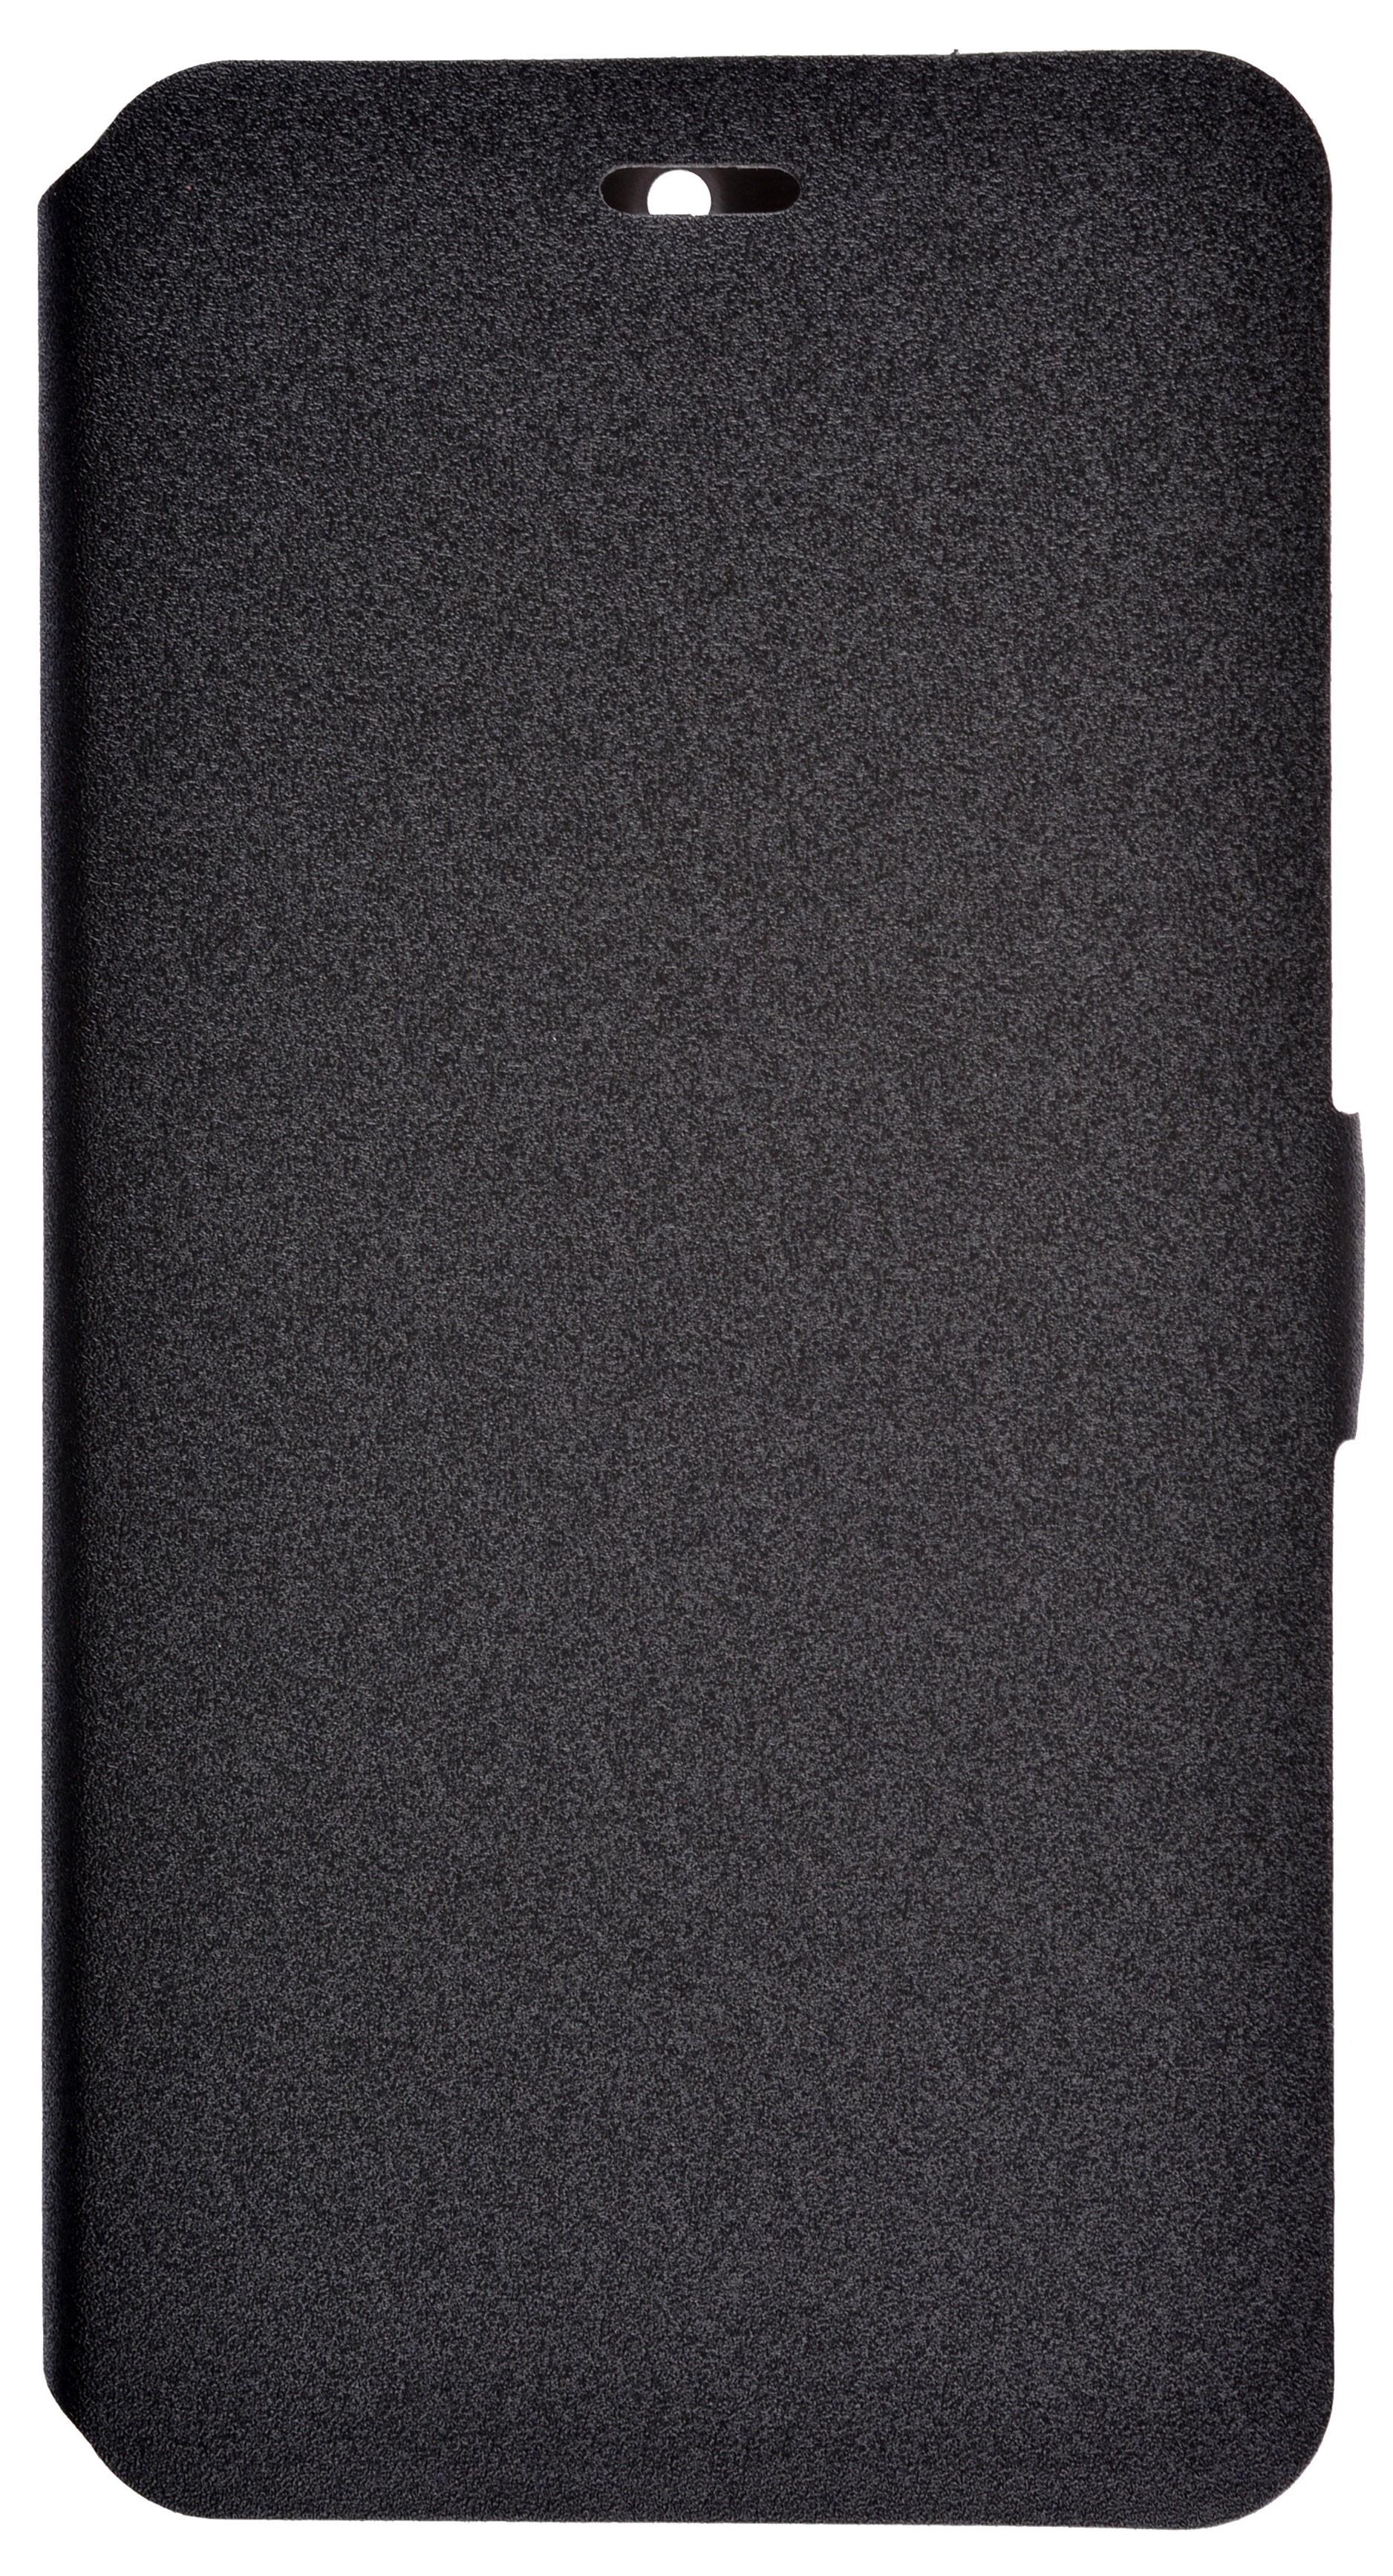 Чехол Prime book чехол-книжка для Asus Zenfone 3 Max ZC520TL, black